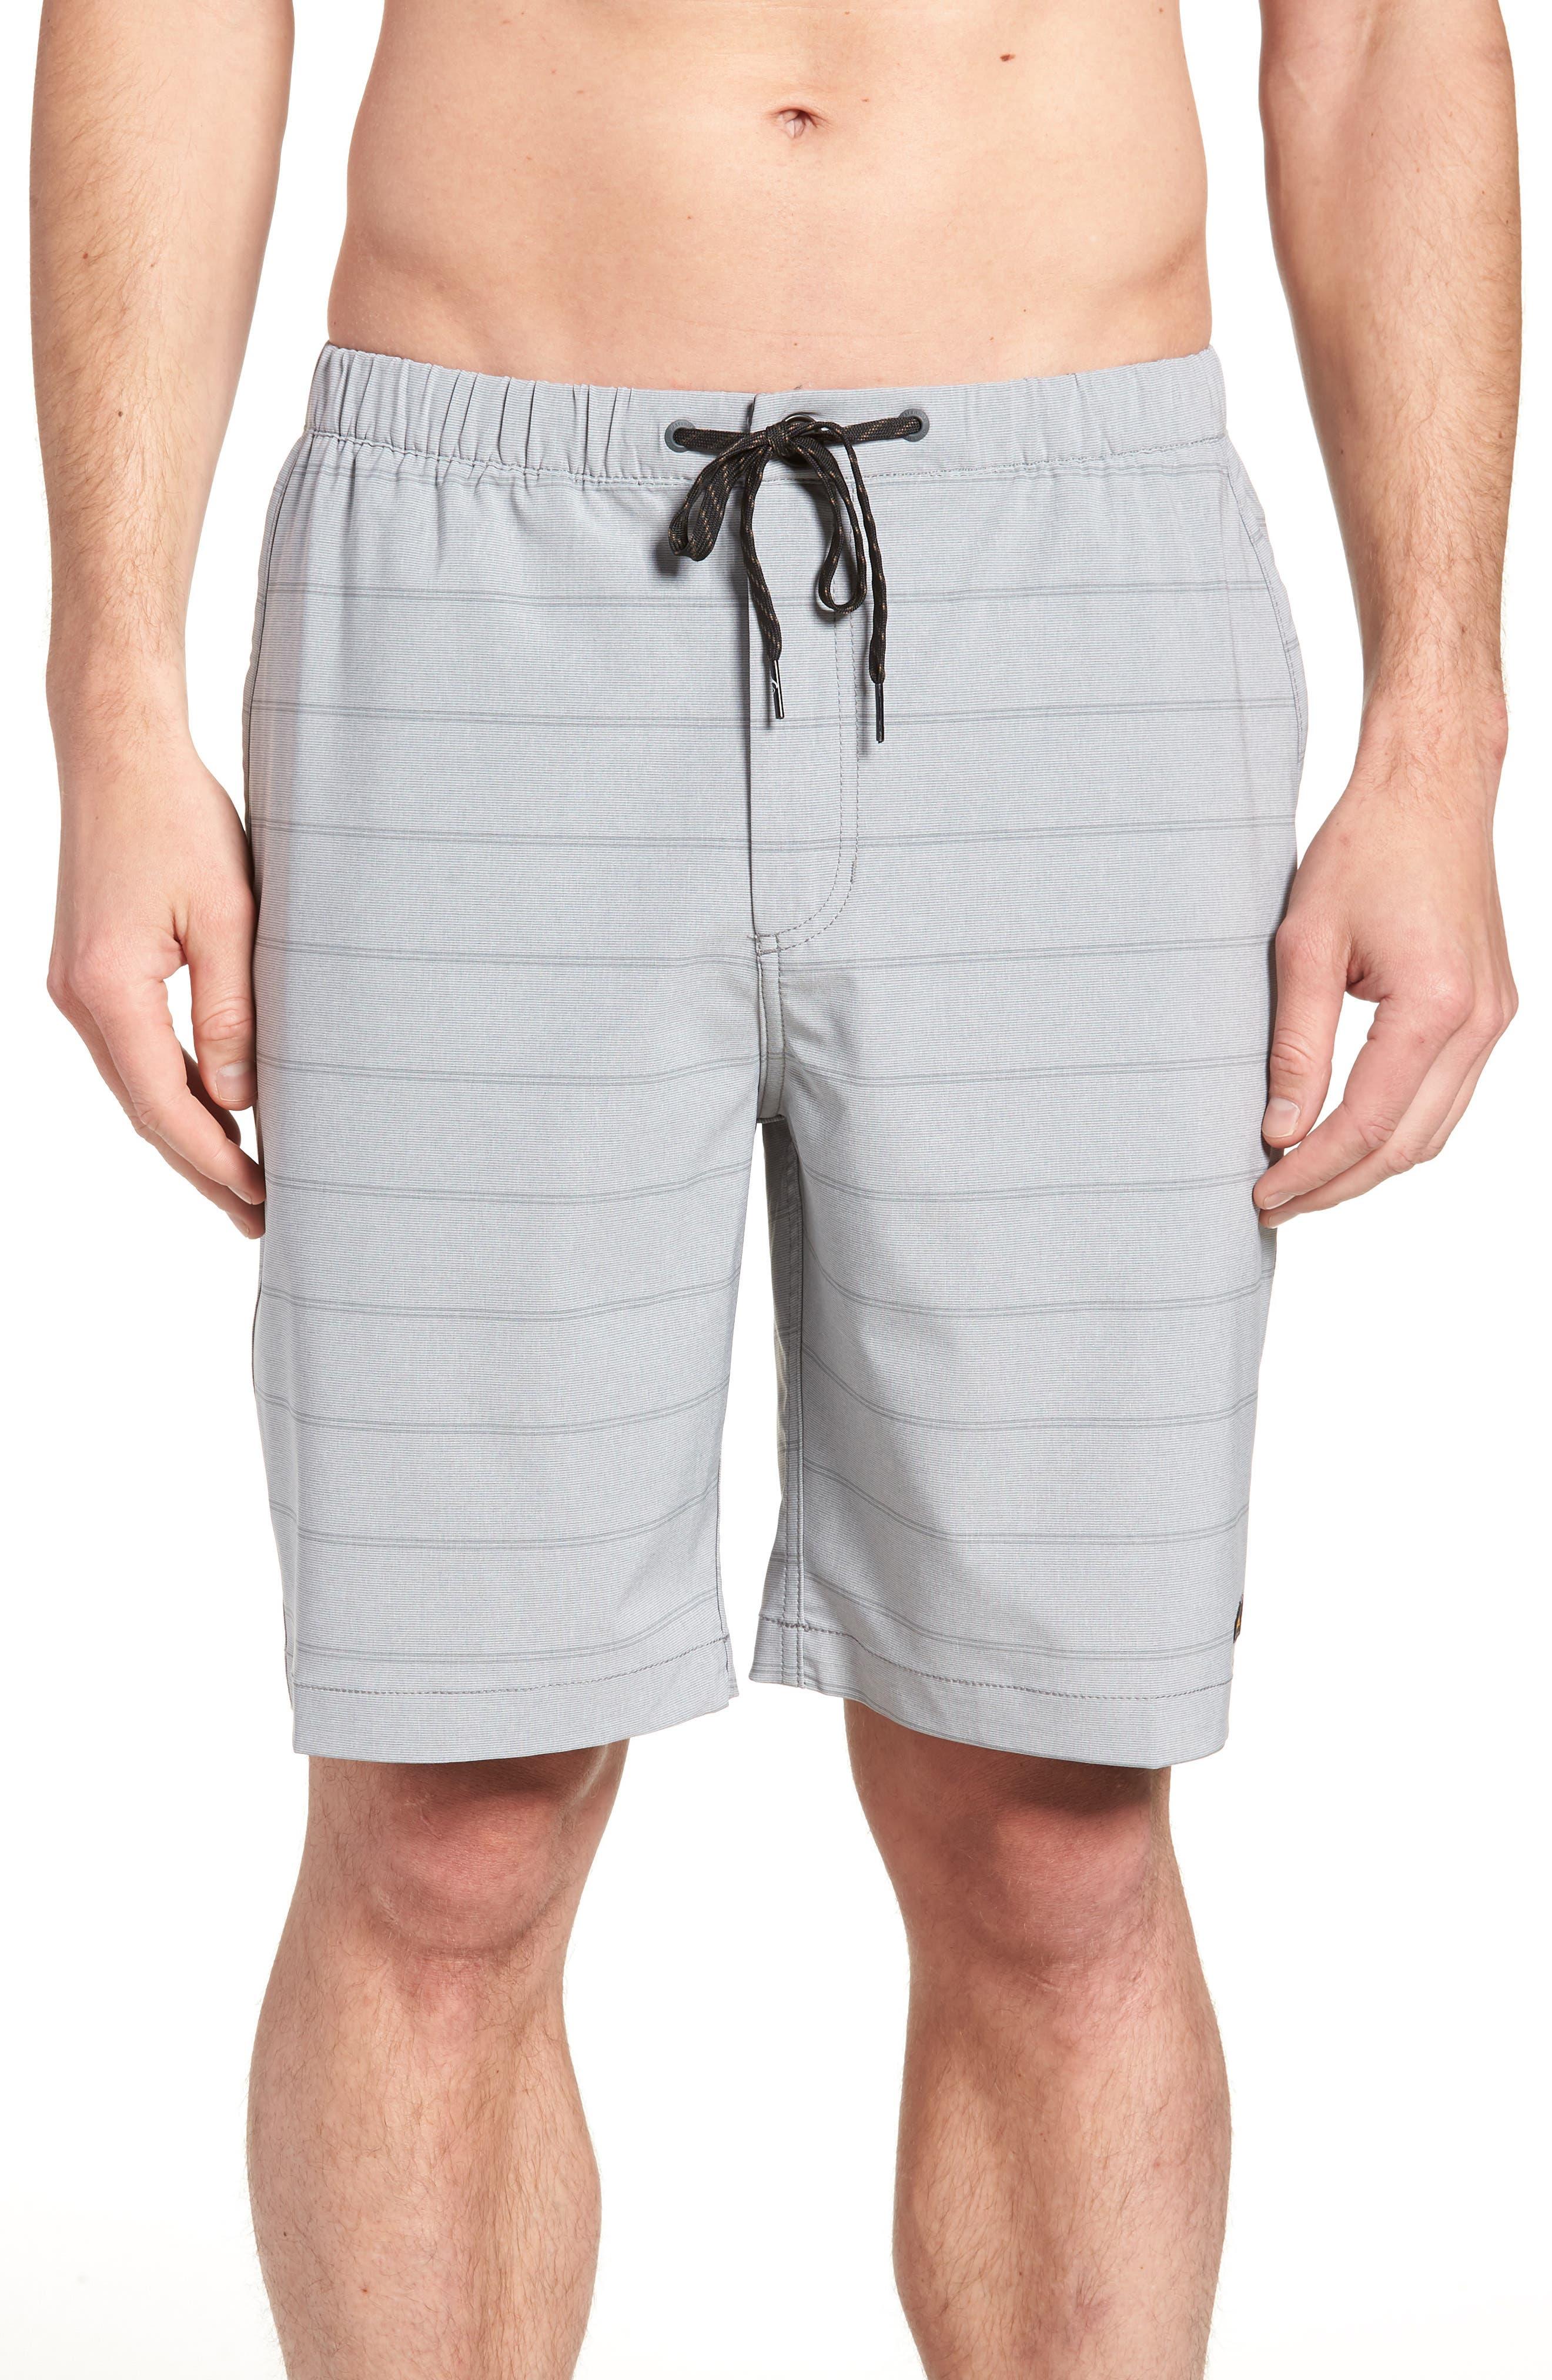 Suva Amphibian Hybrid Shorts,                         Main,                         color, STEEPLE GRAY